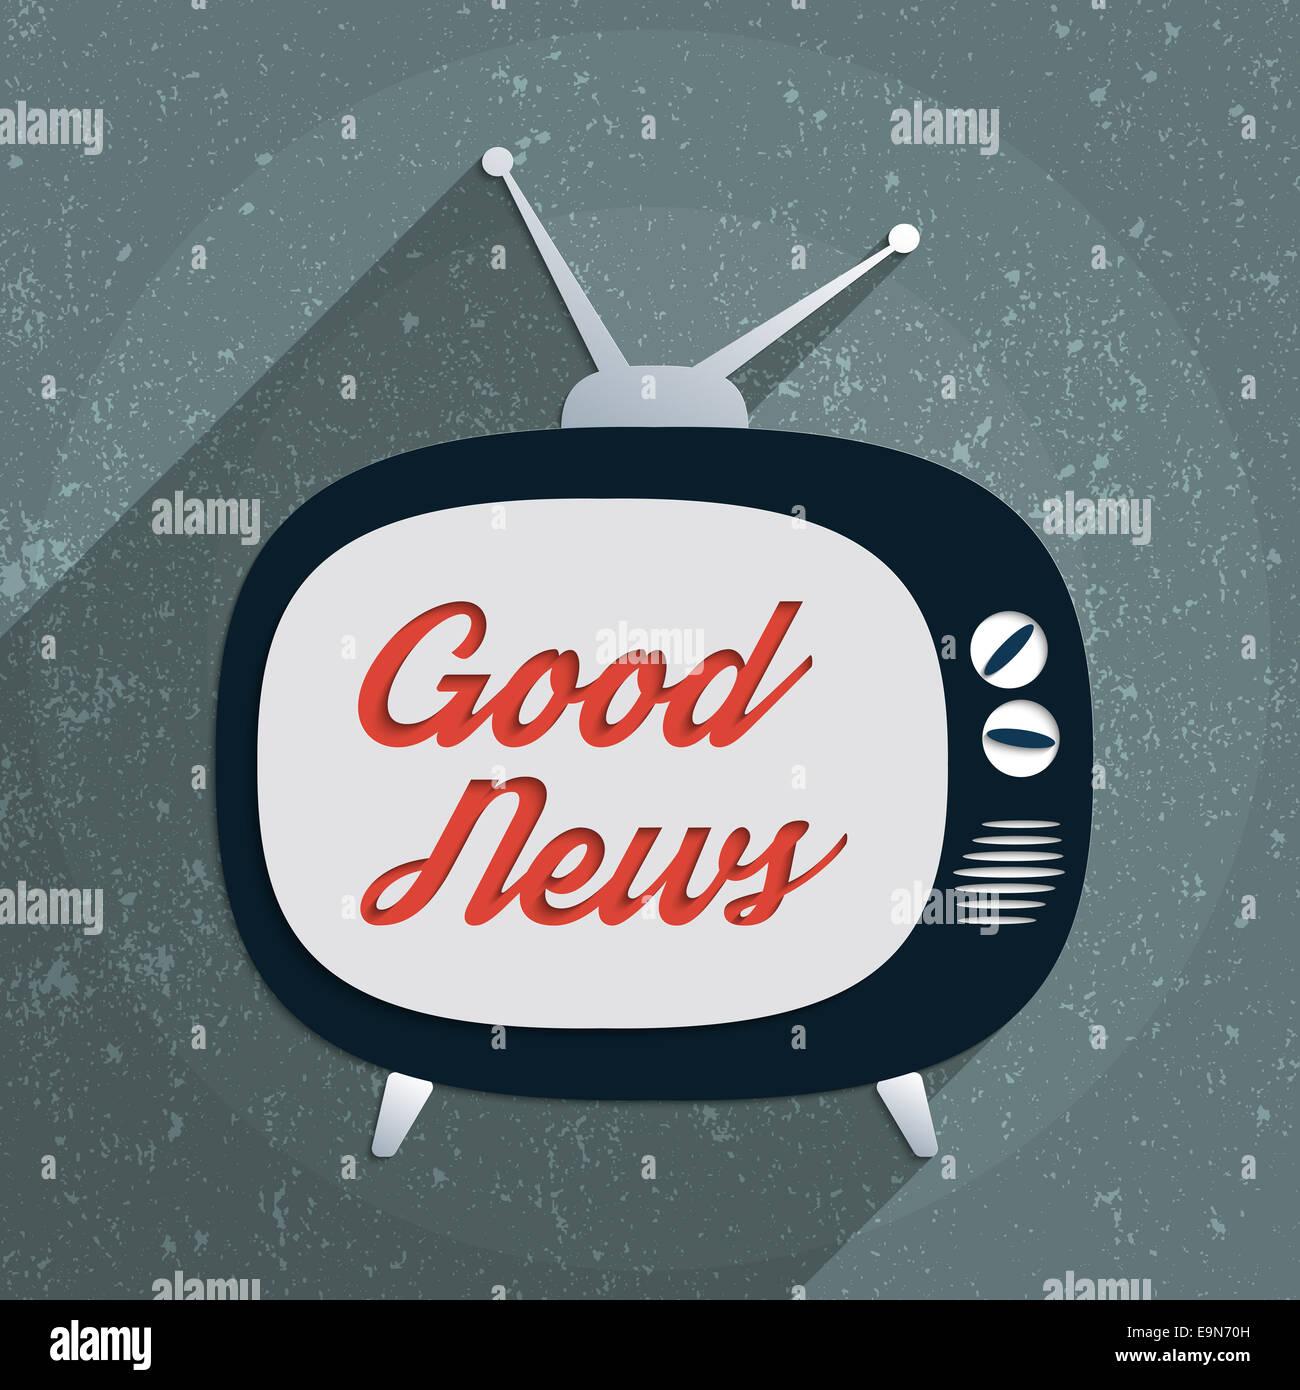 Concept for information society, globalization, propaganda and media manipulation. Flat design illustration. - Stock Image